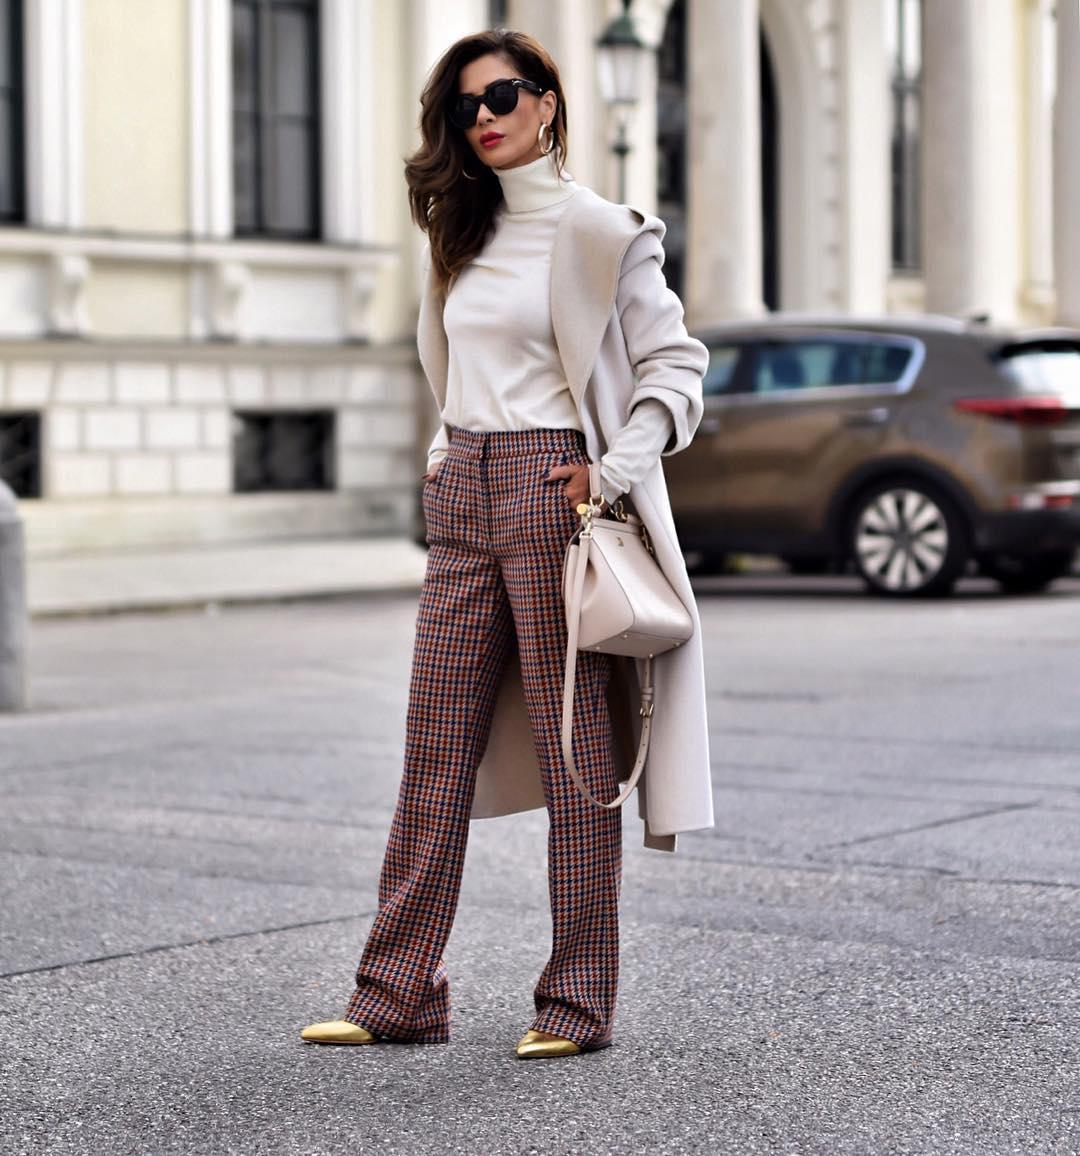 Свитер, как у бабушки: 4 способа носить модный тренд из 90-х